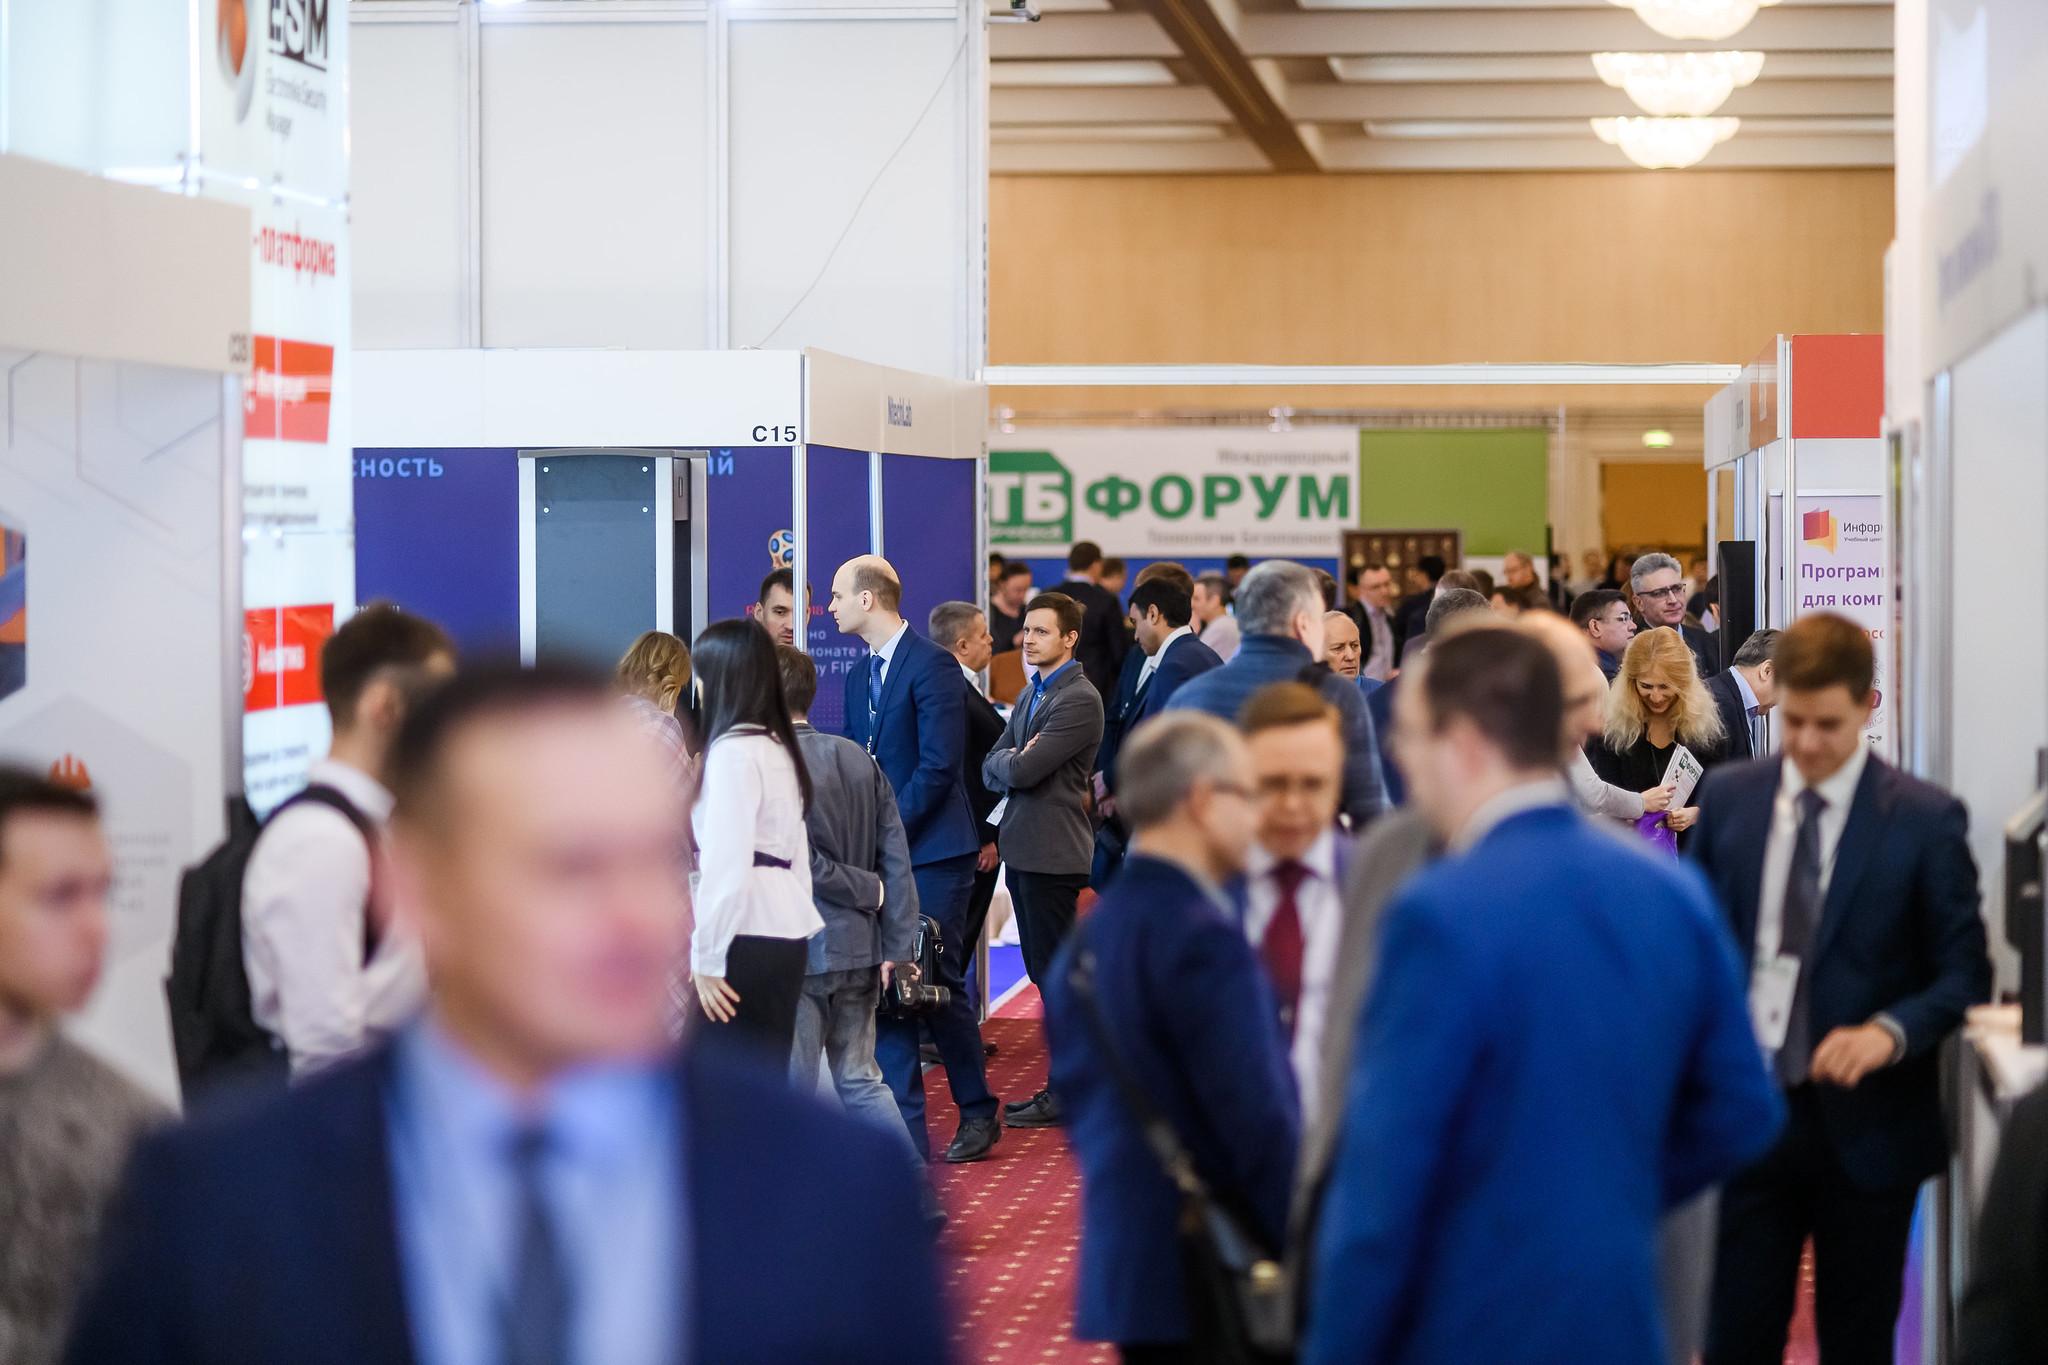 TB Forum exposition